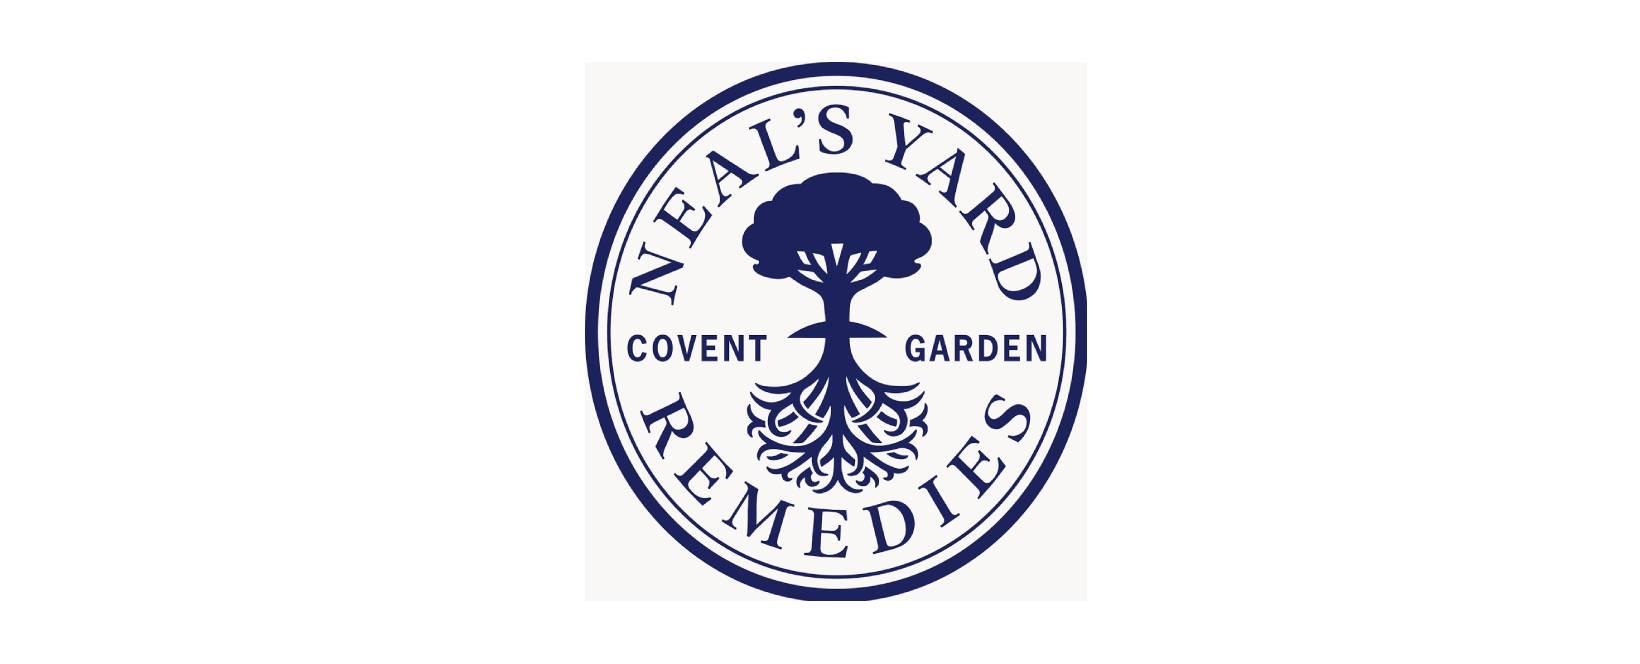 Neals Yard Remedies UK Discount Code 2021